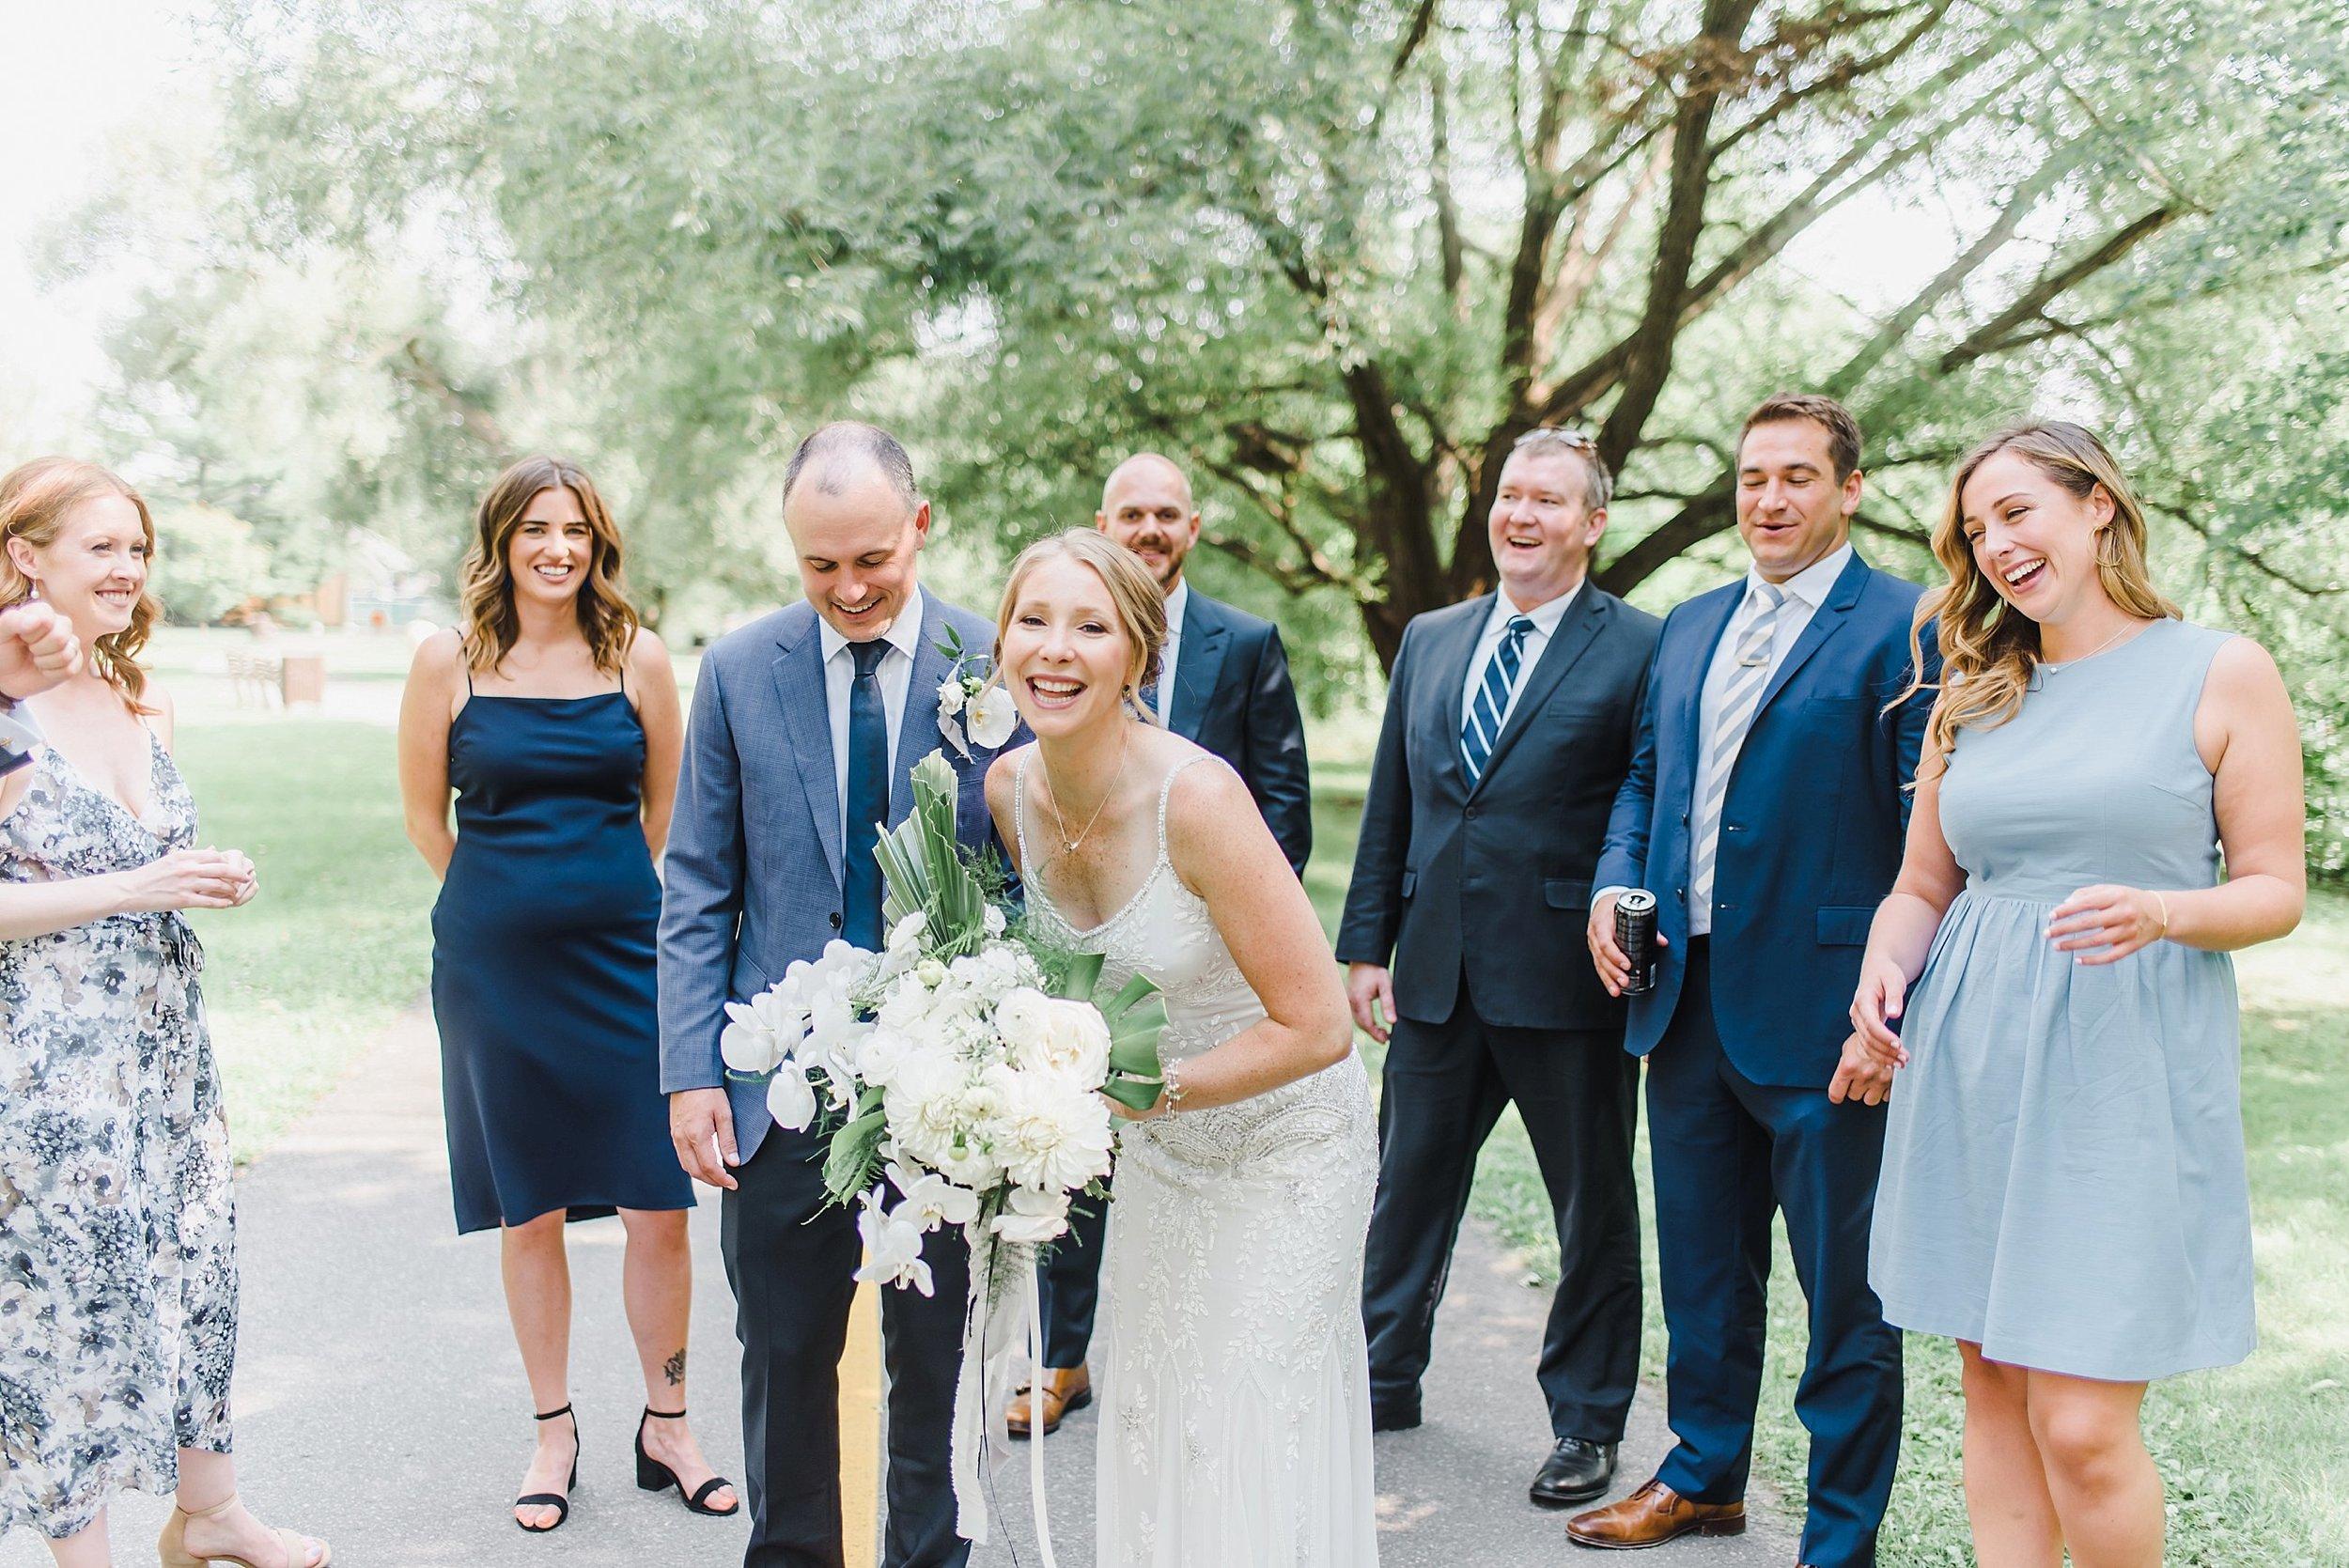 light airy indie fine art ottawa wedding photographer | Ali and Batoul Photography_0665.jpg